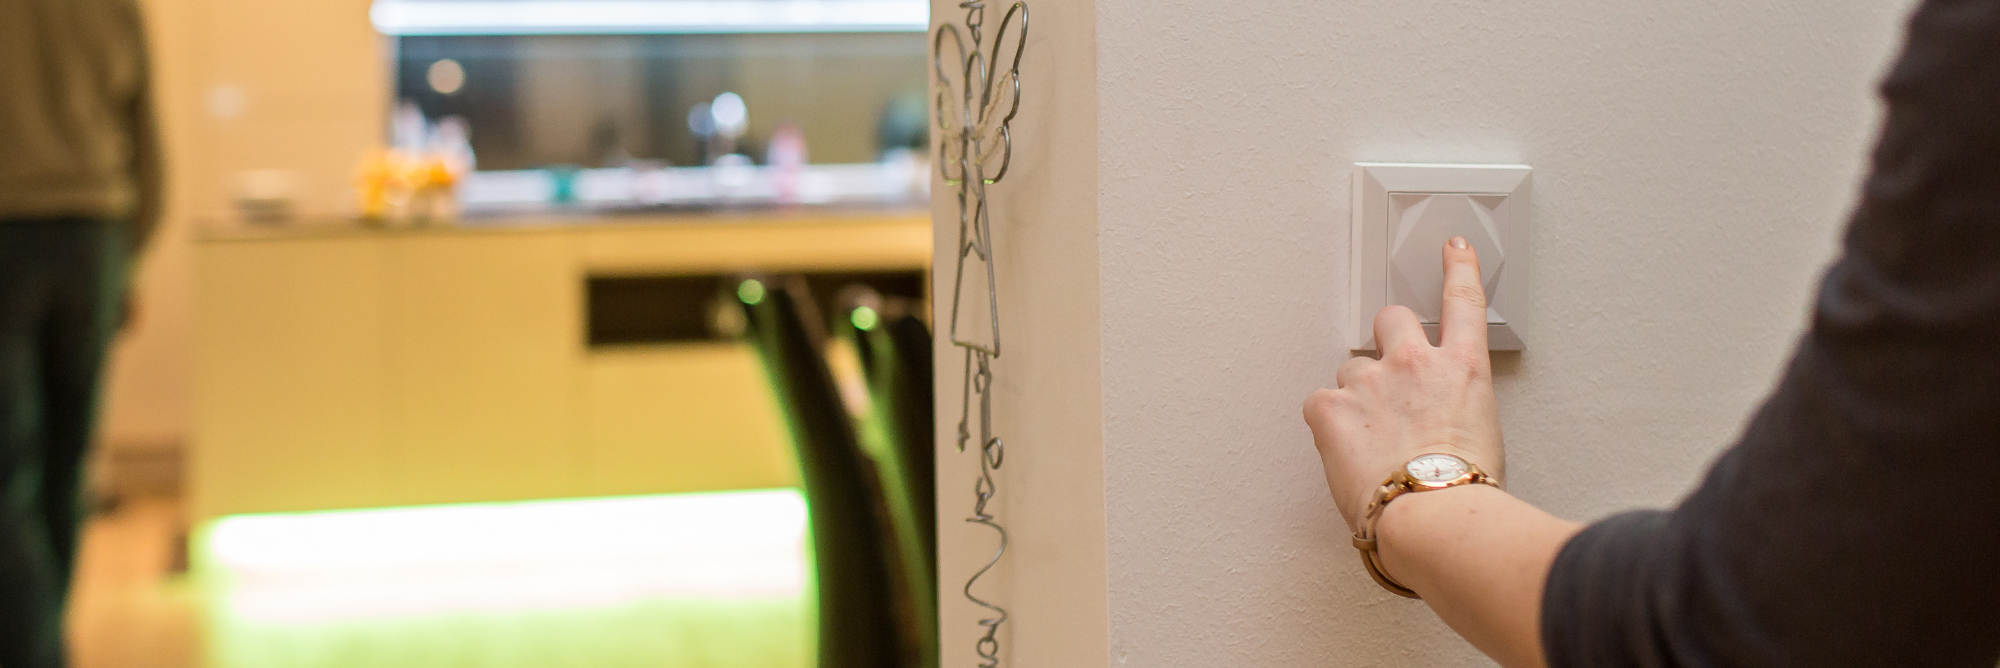 chytré tlačítko na zdi